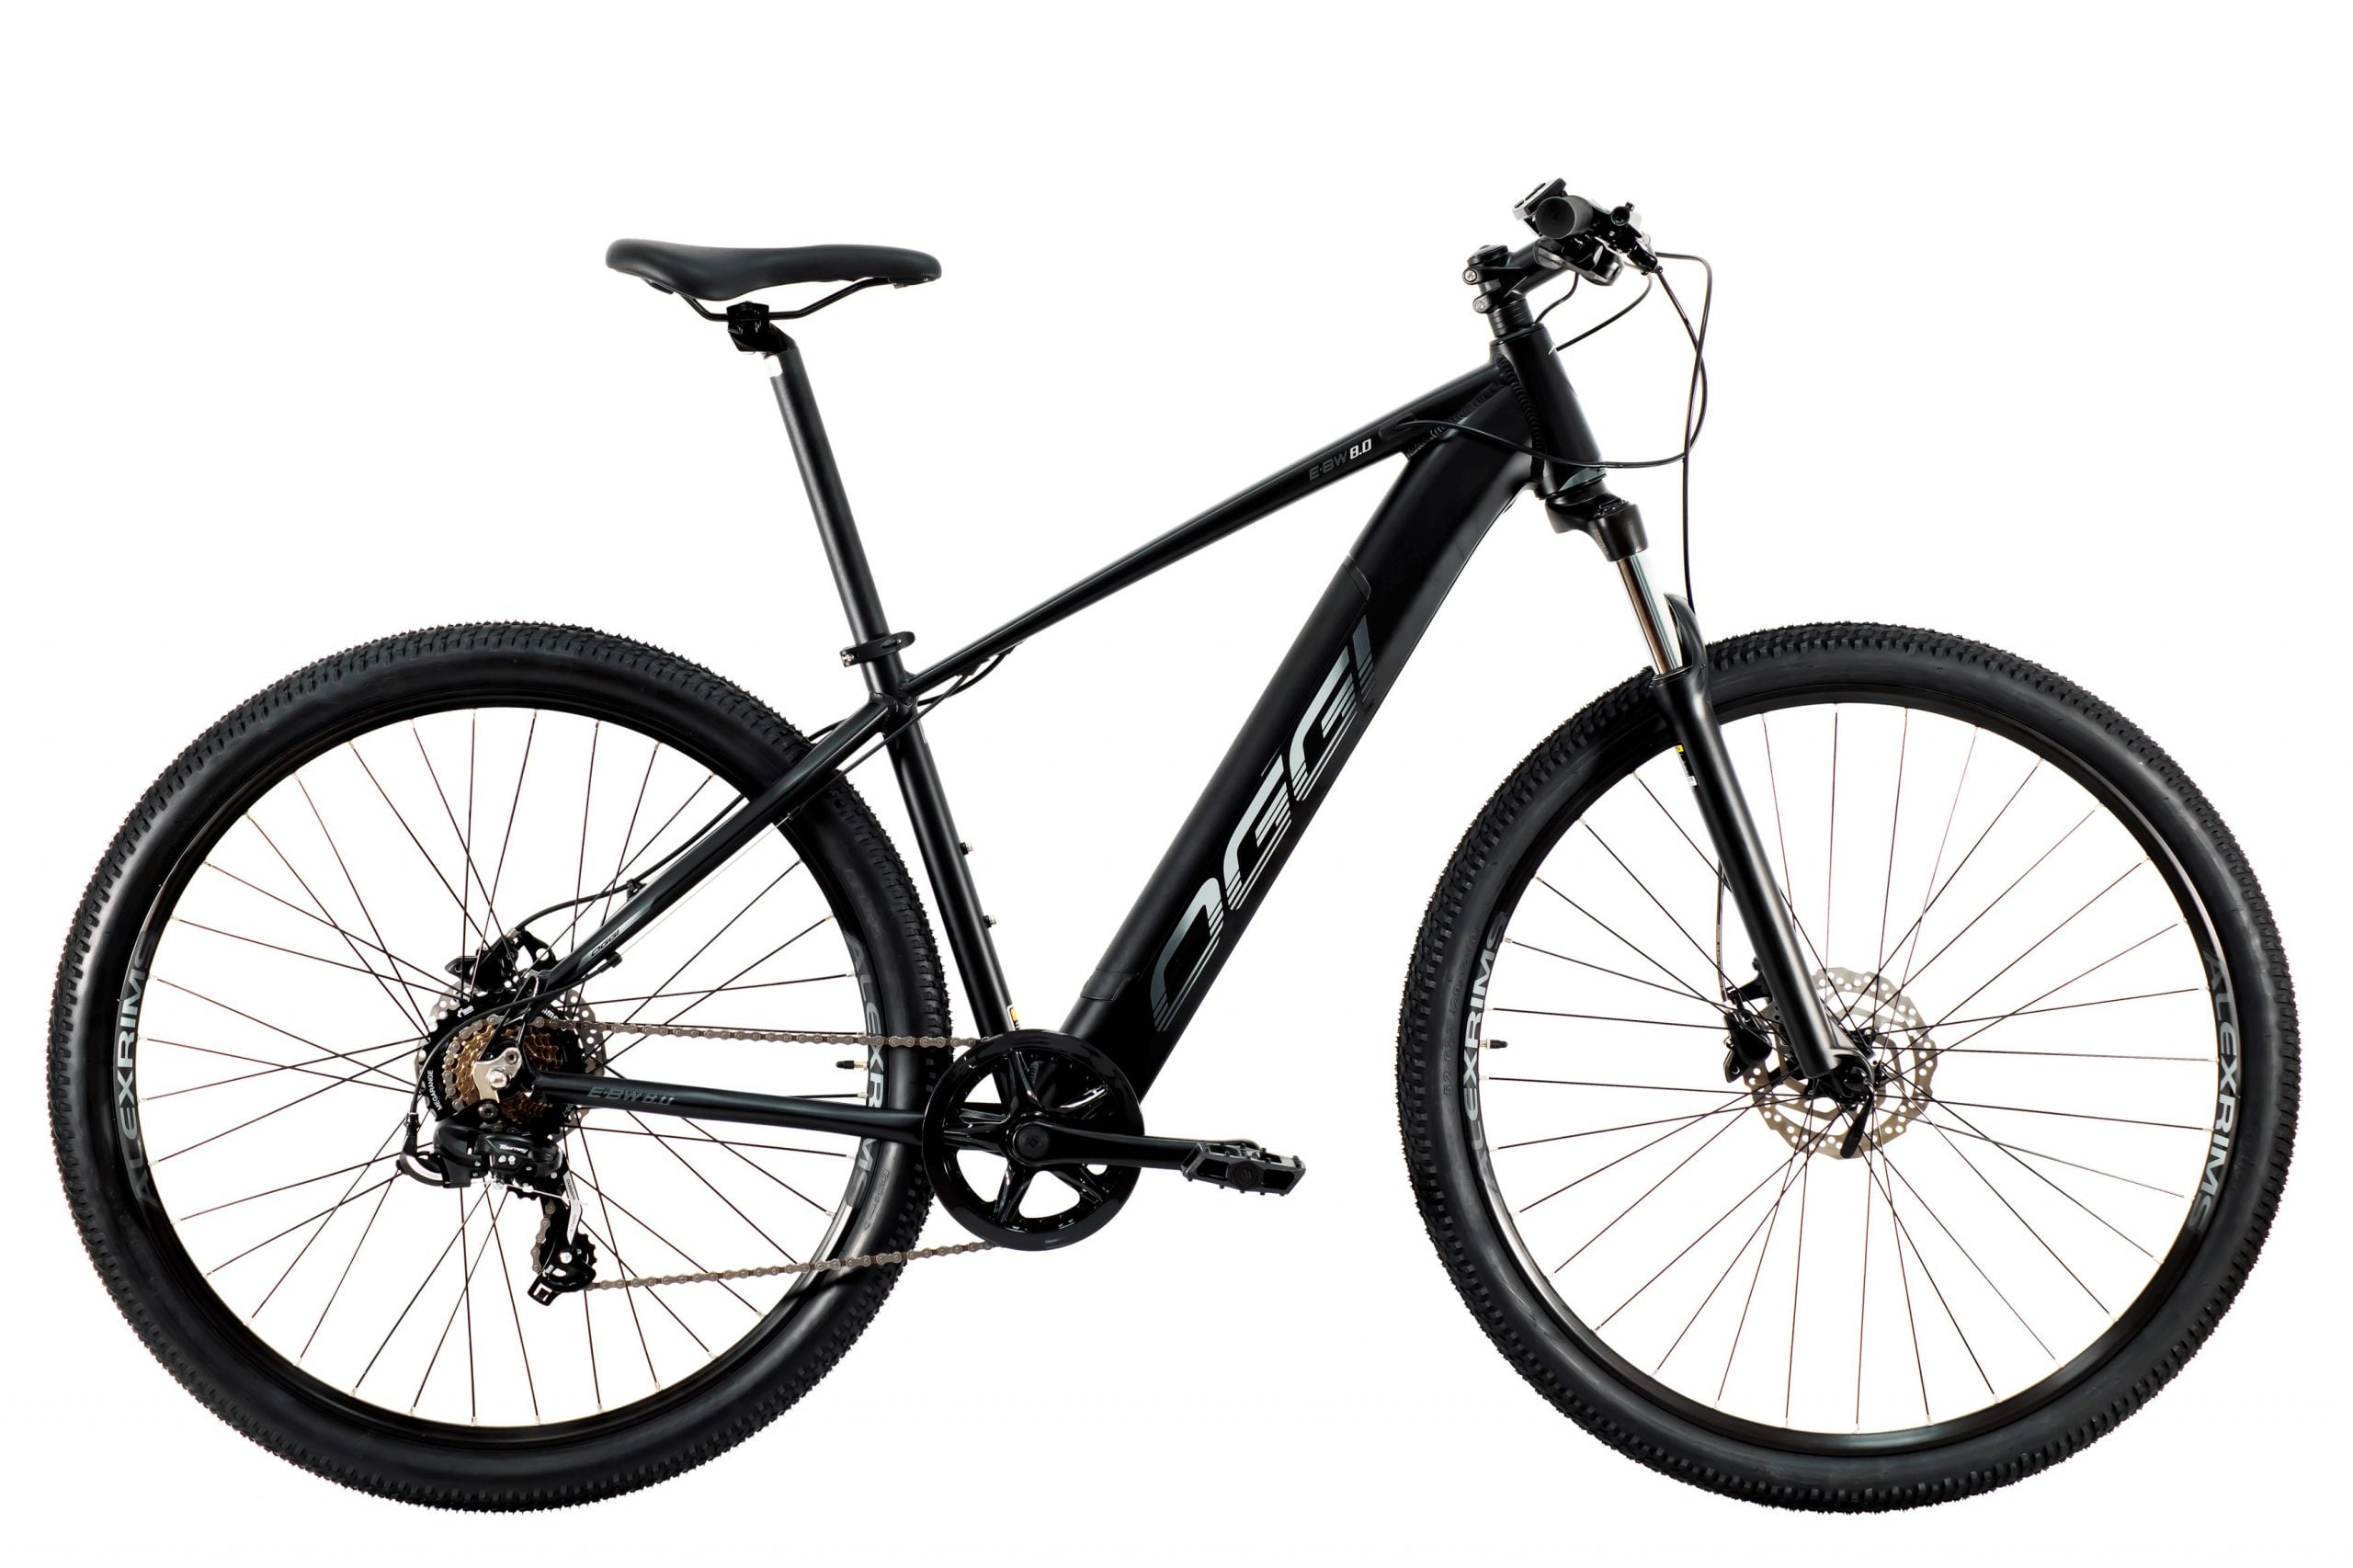 Bicicleta Elétrica Oggi Big Wheel 8.0 2021 Preta/Grafite Aro 29, 7v